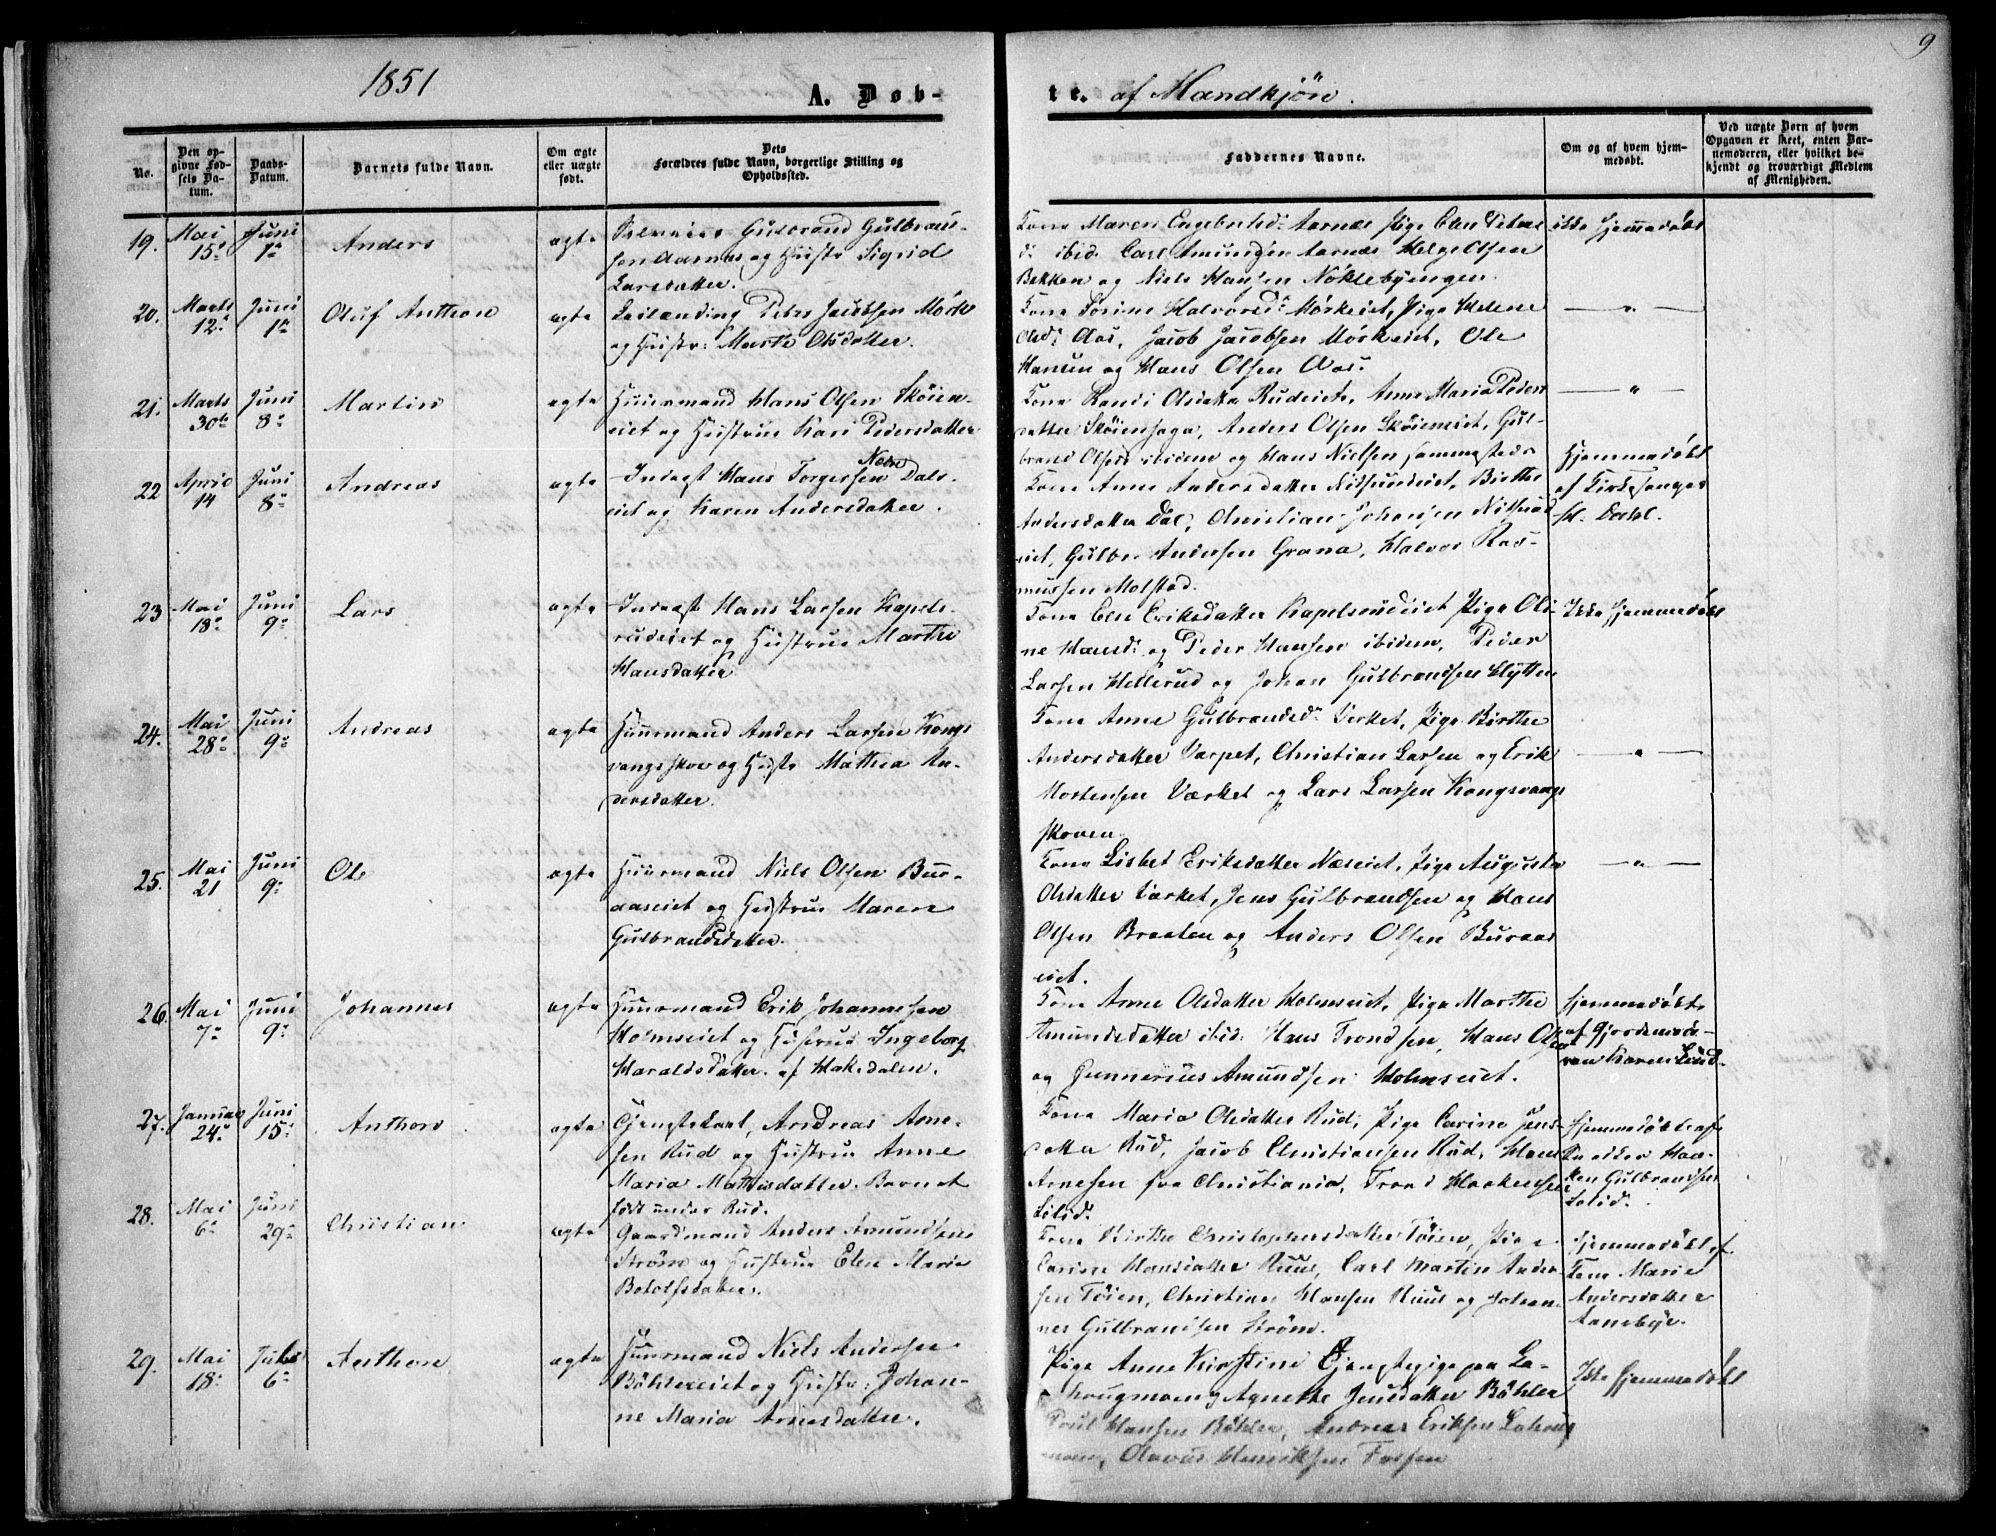 SAO, Nittedal prestekontor Kirkebøker, F/Fa/L0005: Ministerialbok nr. I 5, 1850-1862, s. 9